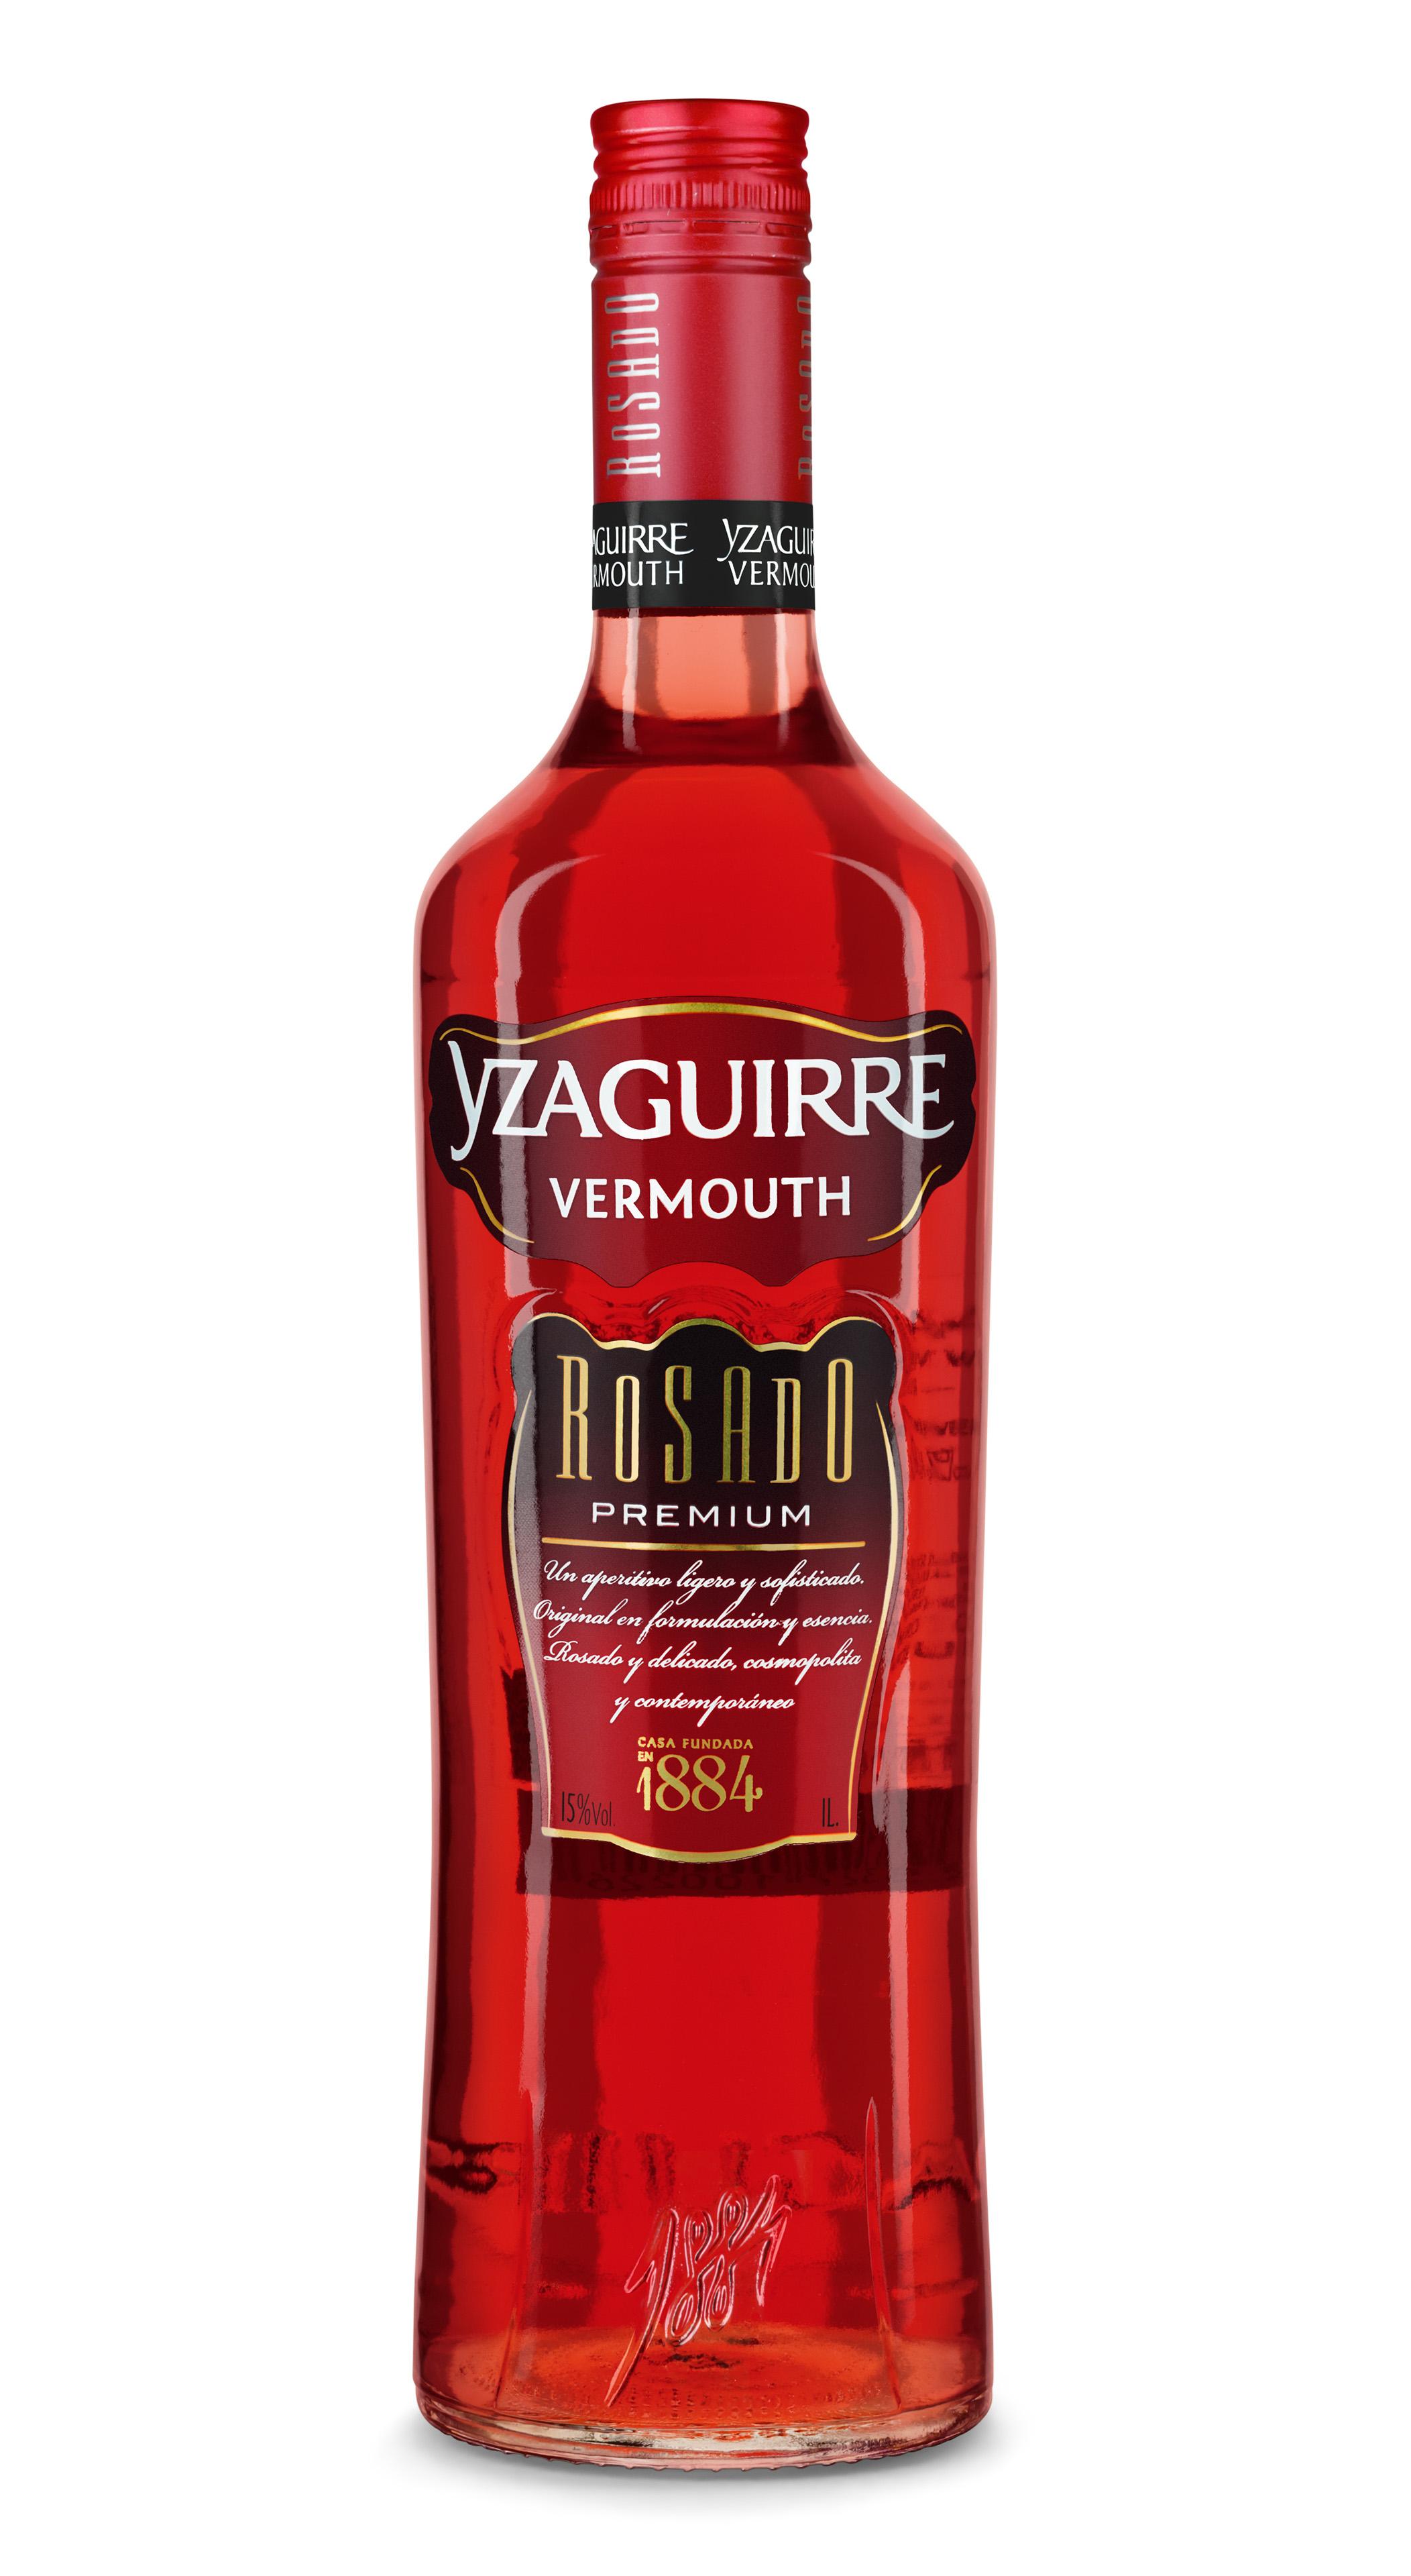 yzaguirre vermouth rosado 1 0 l f r 8 90 kaufen bei dr. Black Bedroom Furniture Sets. Home Design Ideas